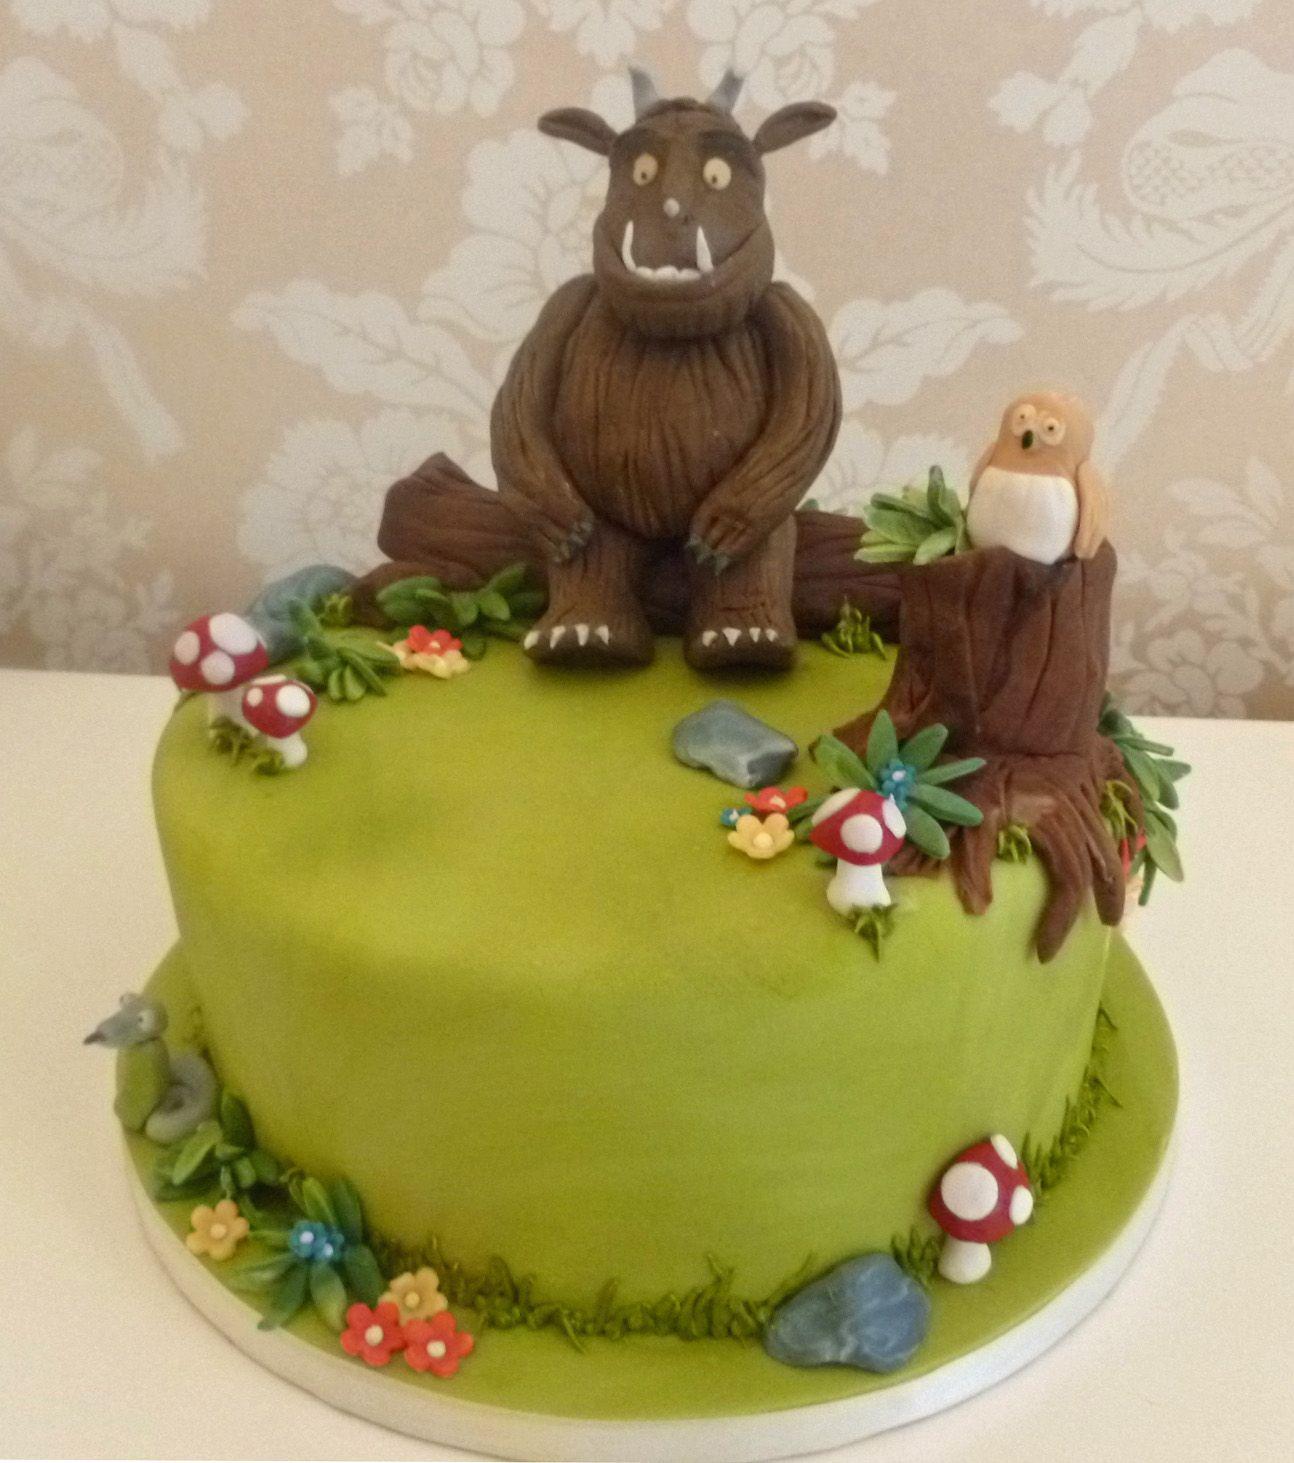 Gruffalo Novelty Cake.jpg (1294×1463)